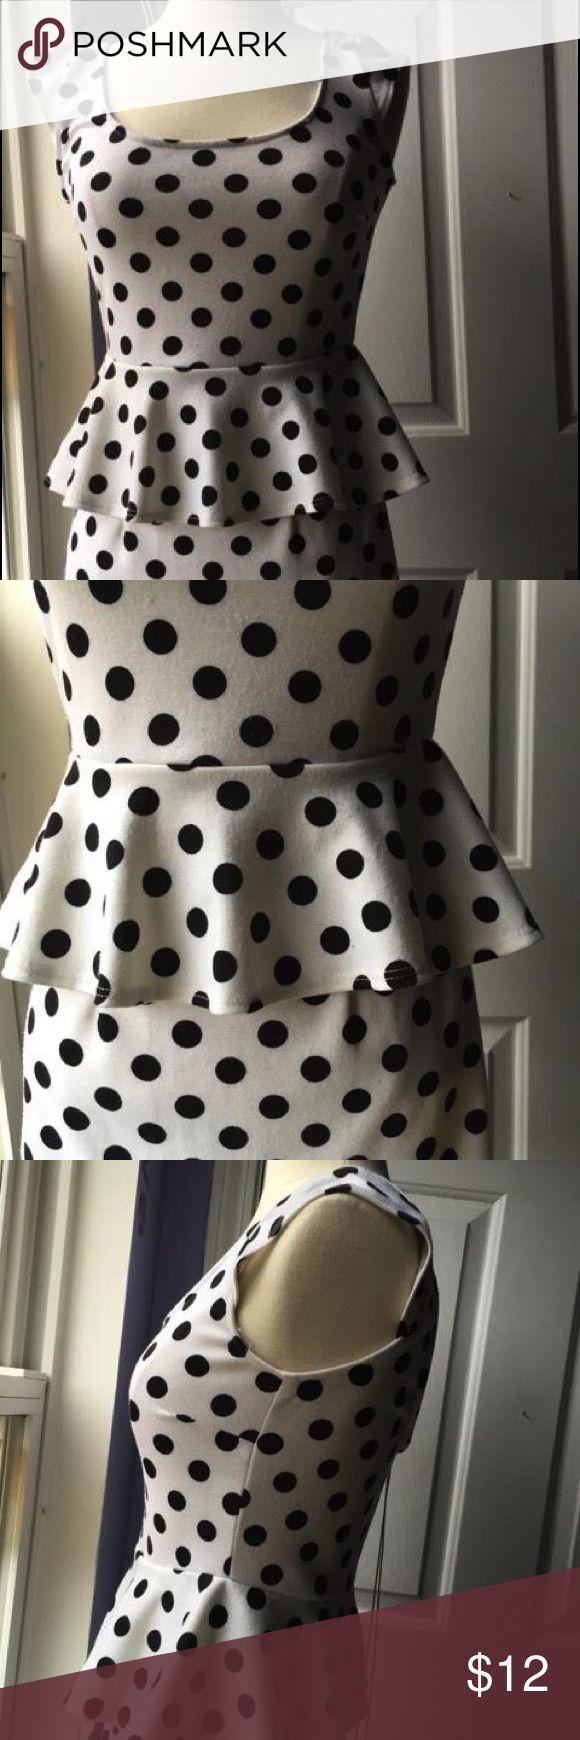 Polka dot bodycon dress with peplum detail Body-hugging peplum dress with polka dot print in black and white. Dresses Mini